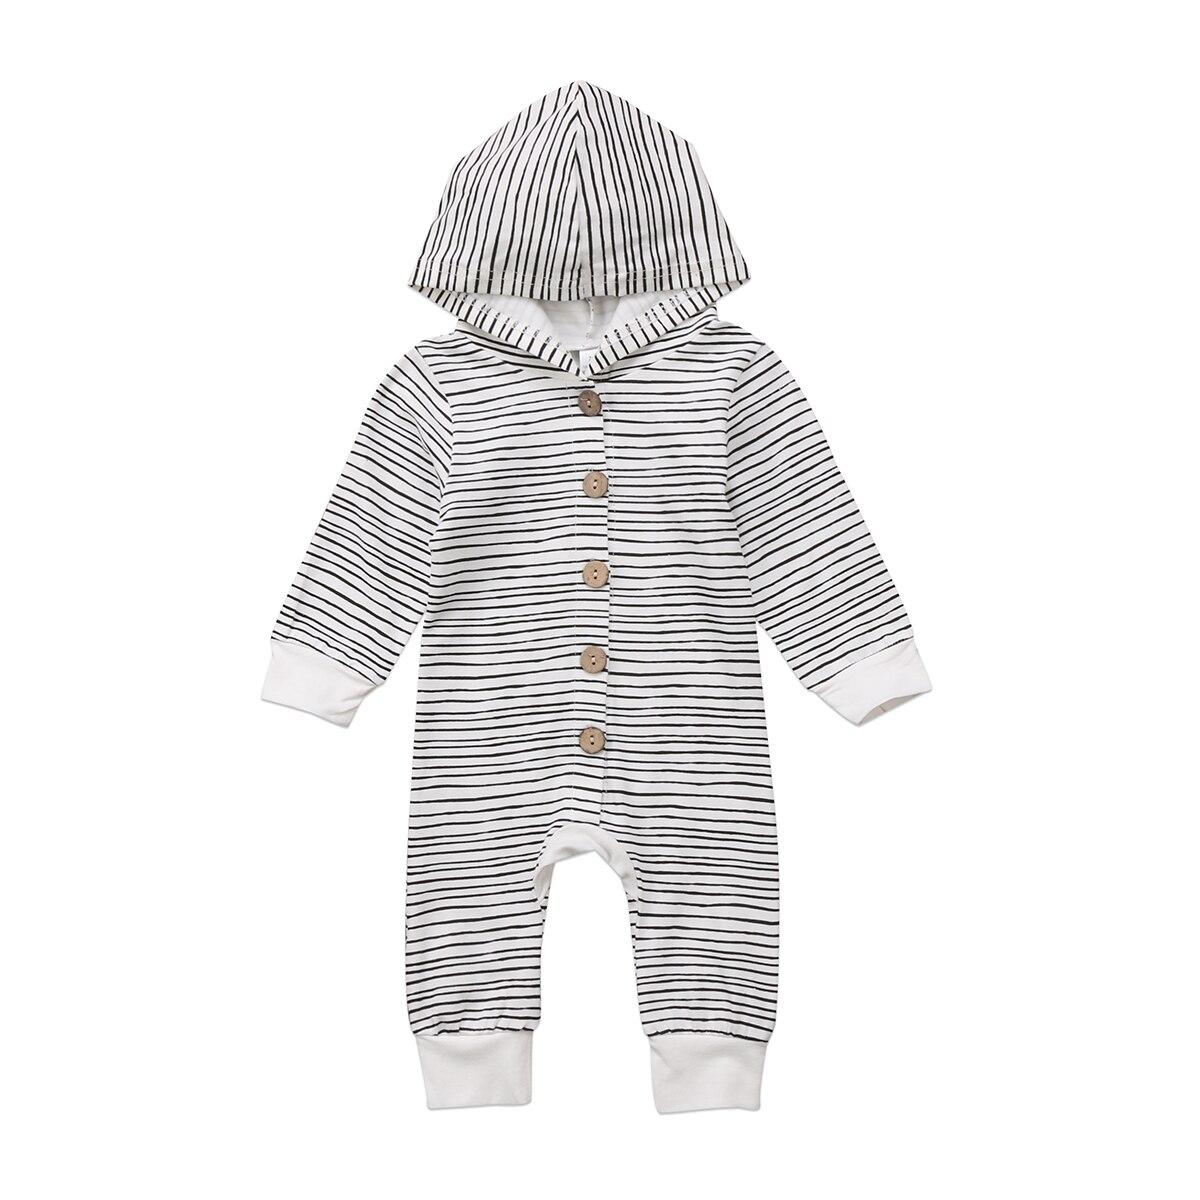 HTB1jI53ehPI8KJjSspfq6ACFXXap 2018 Brand New Toddler Newborn Baby Boy Girl Warm Infant Romper Striped Jumpsuit Hooded Clothes Long Sleeve Outfit